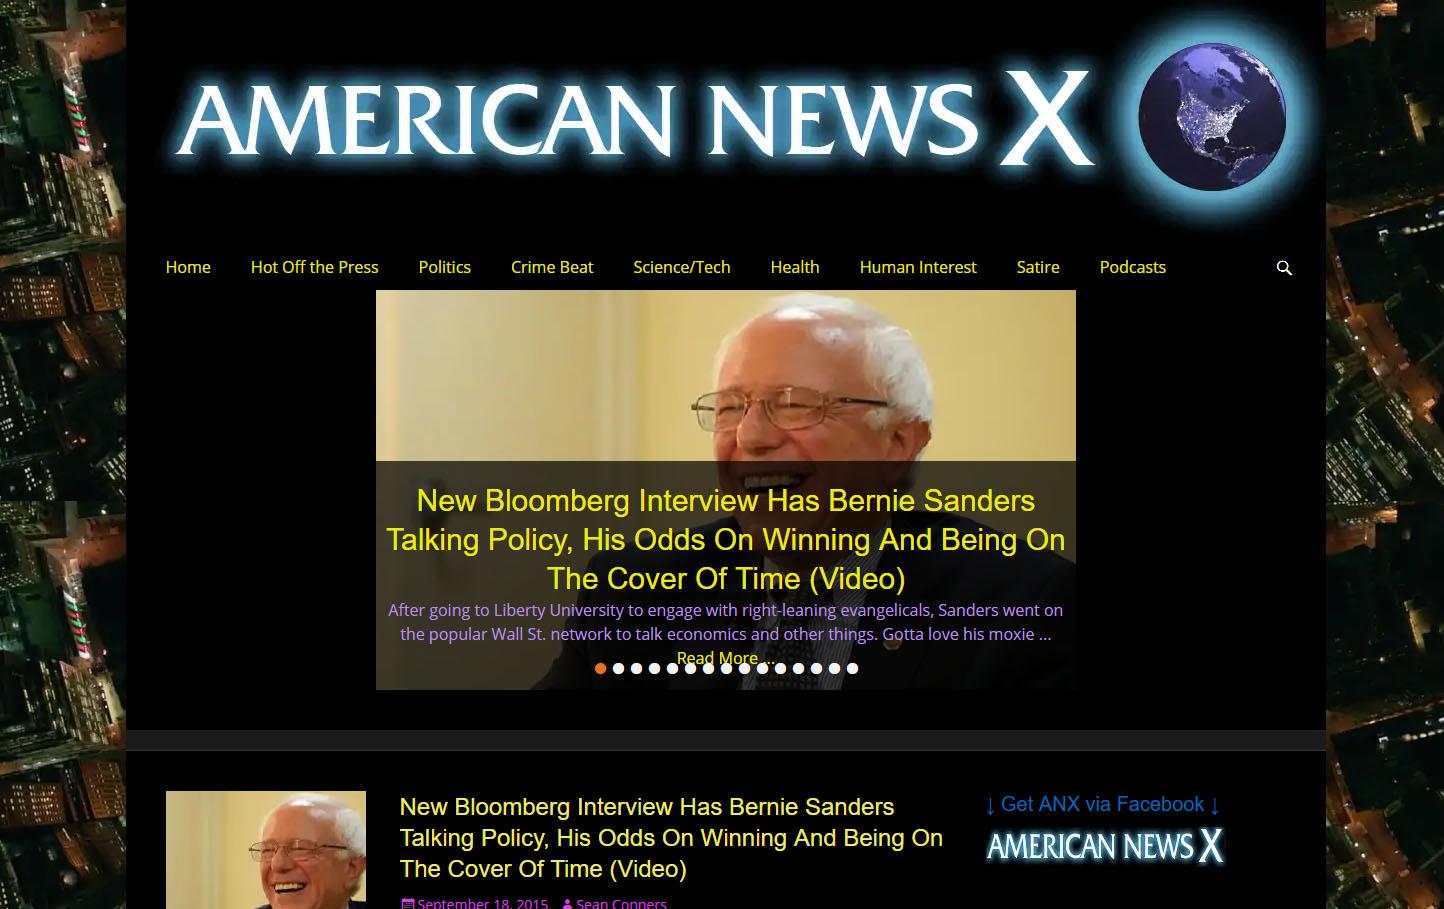 American News X - site redesign - before screenshot.